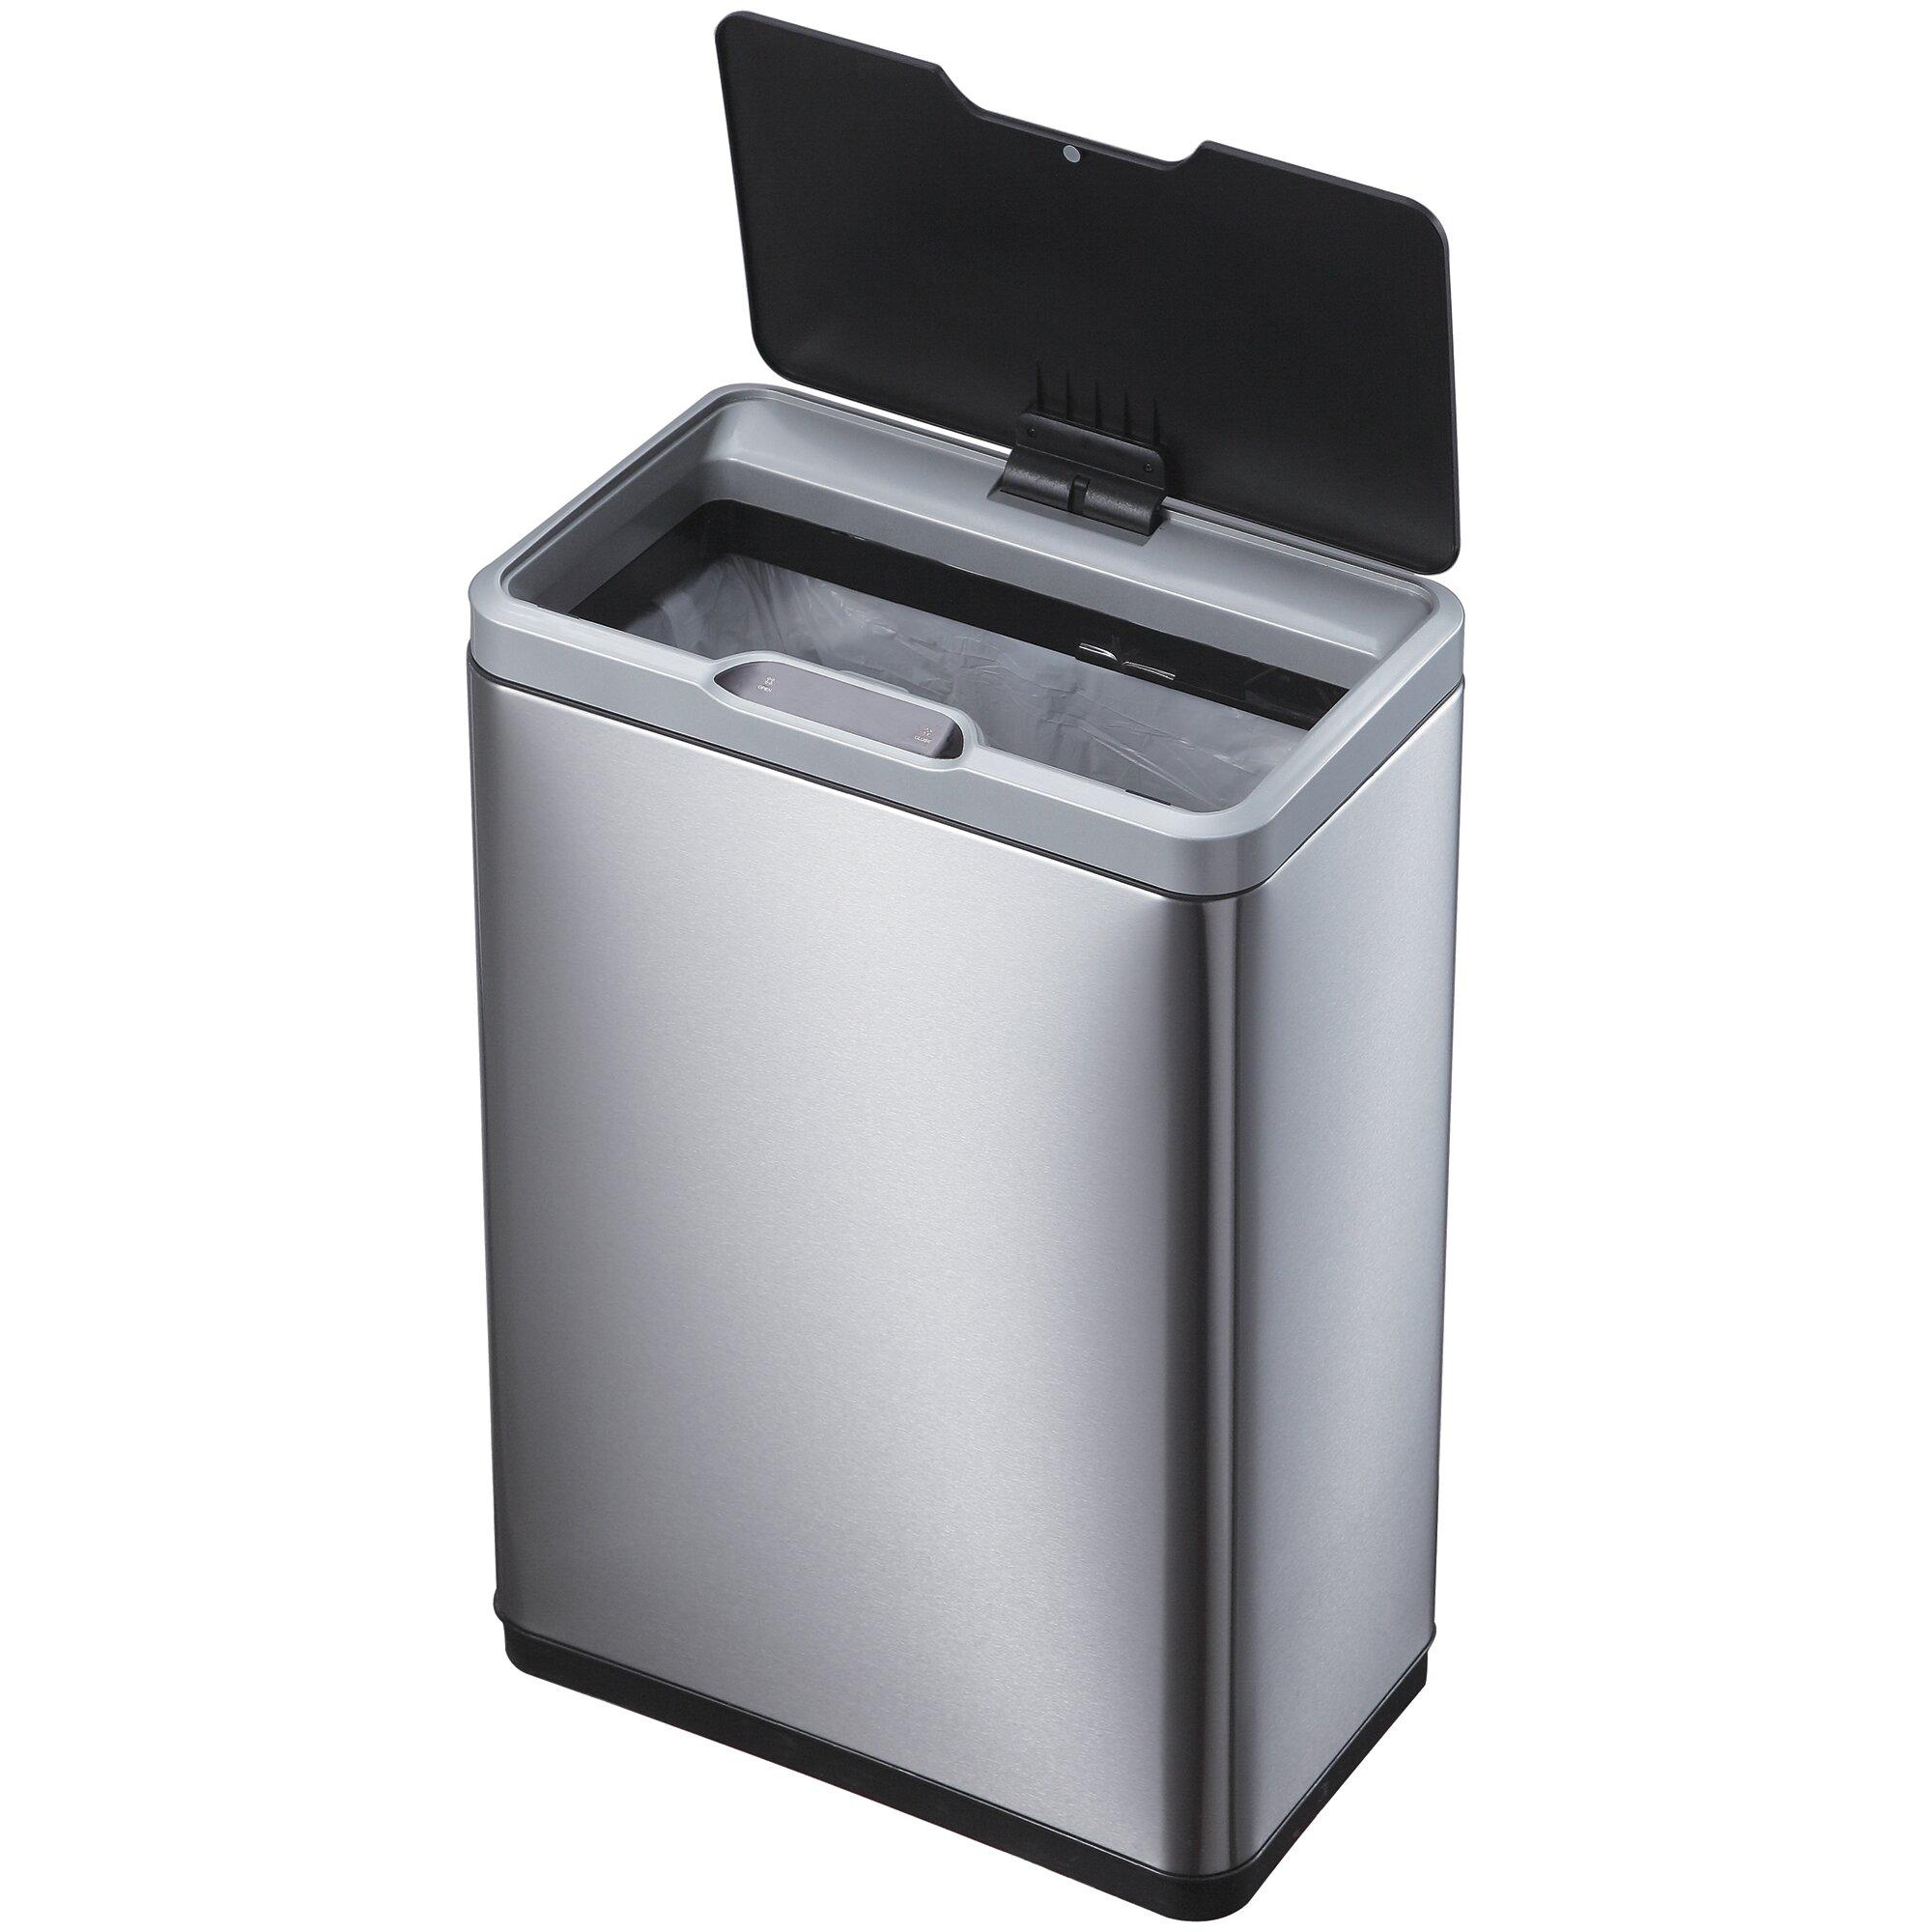 Bathroom Garbage Cans  Commercial Restroom Trash Cans